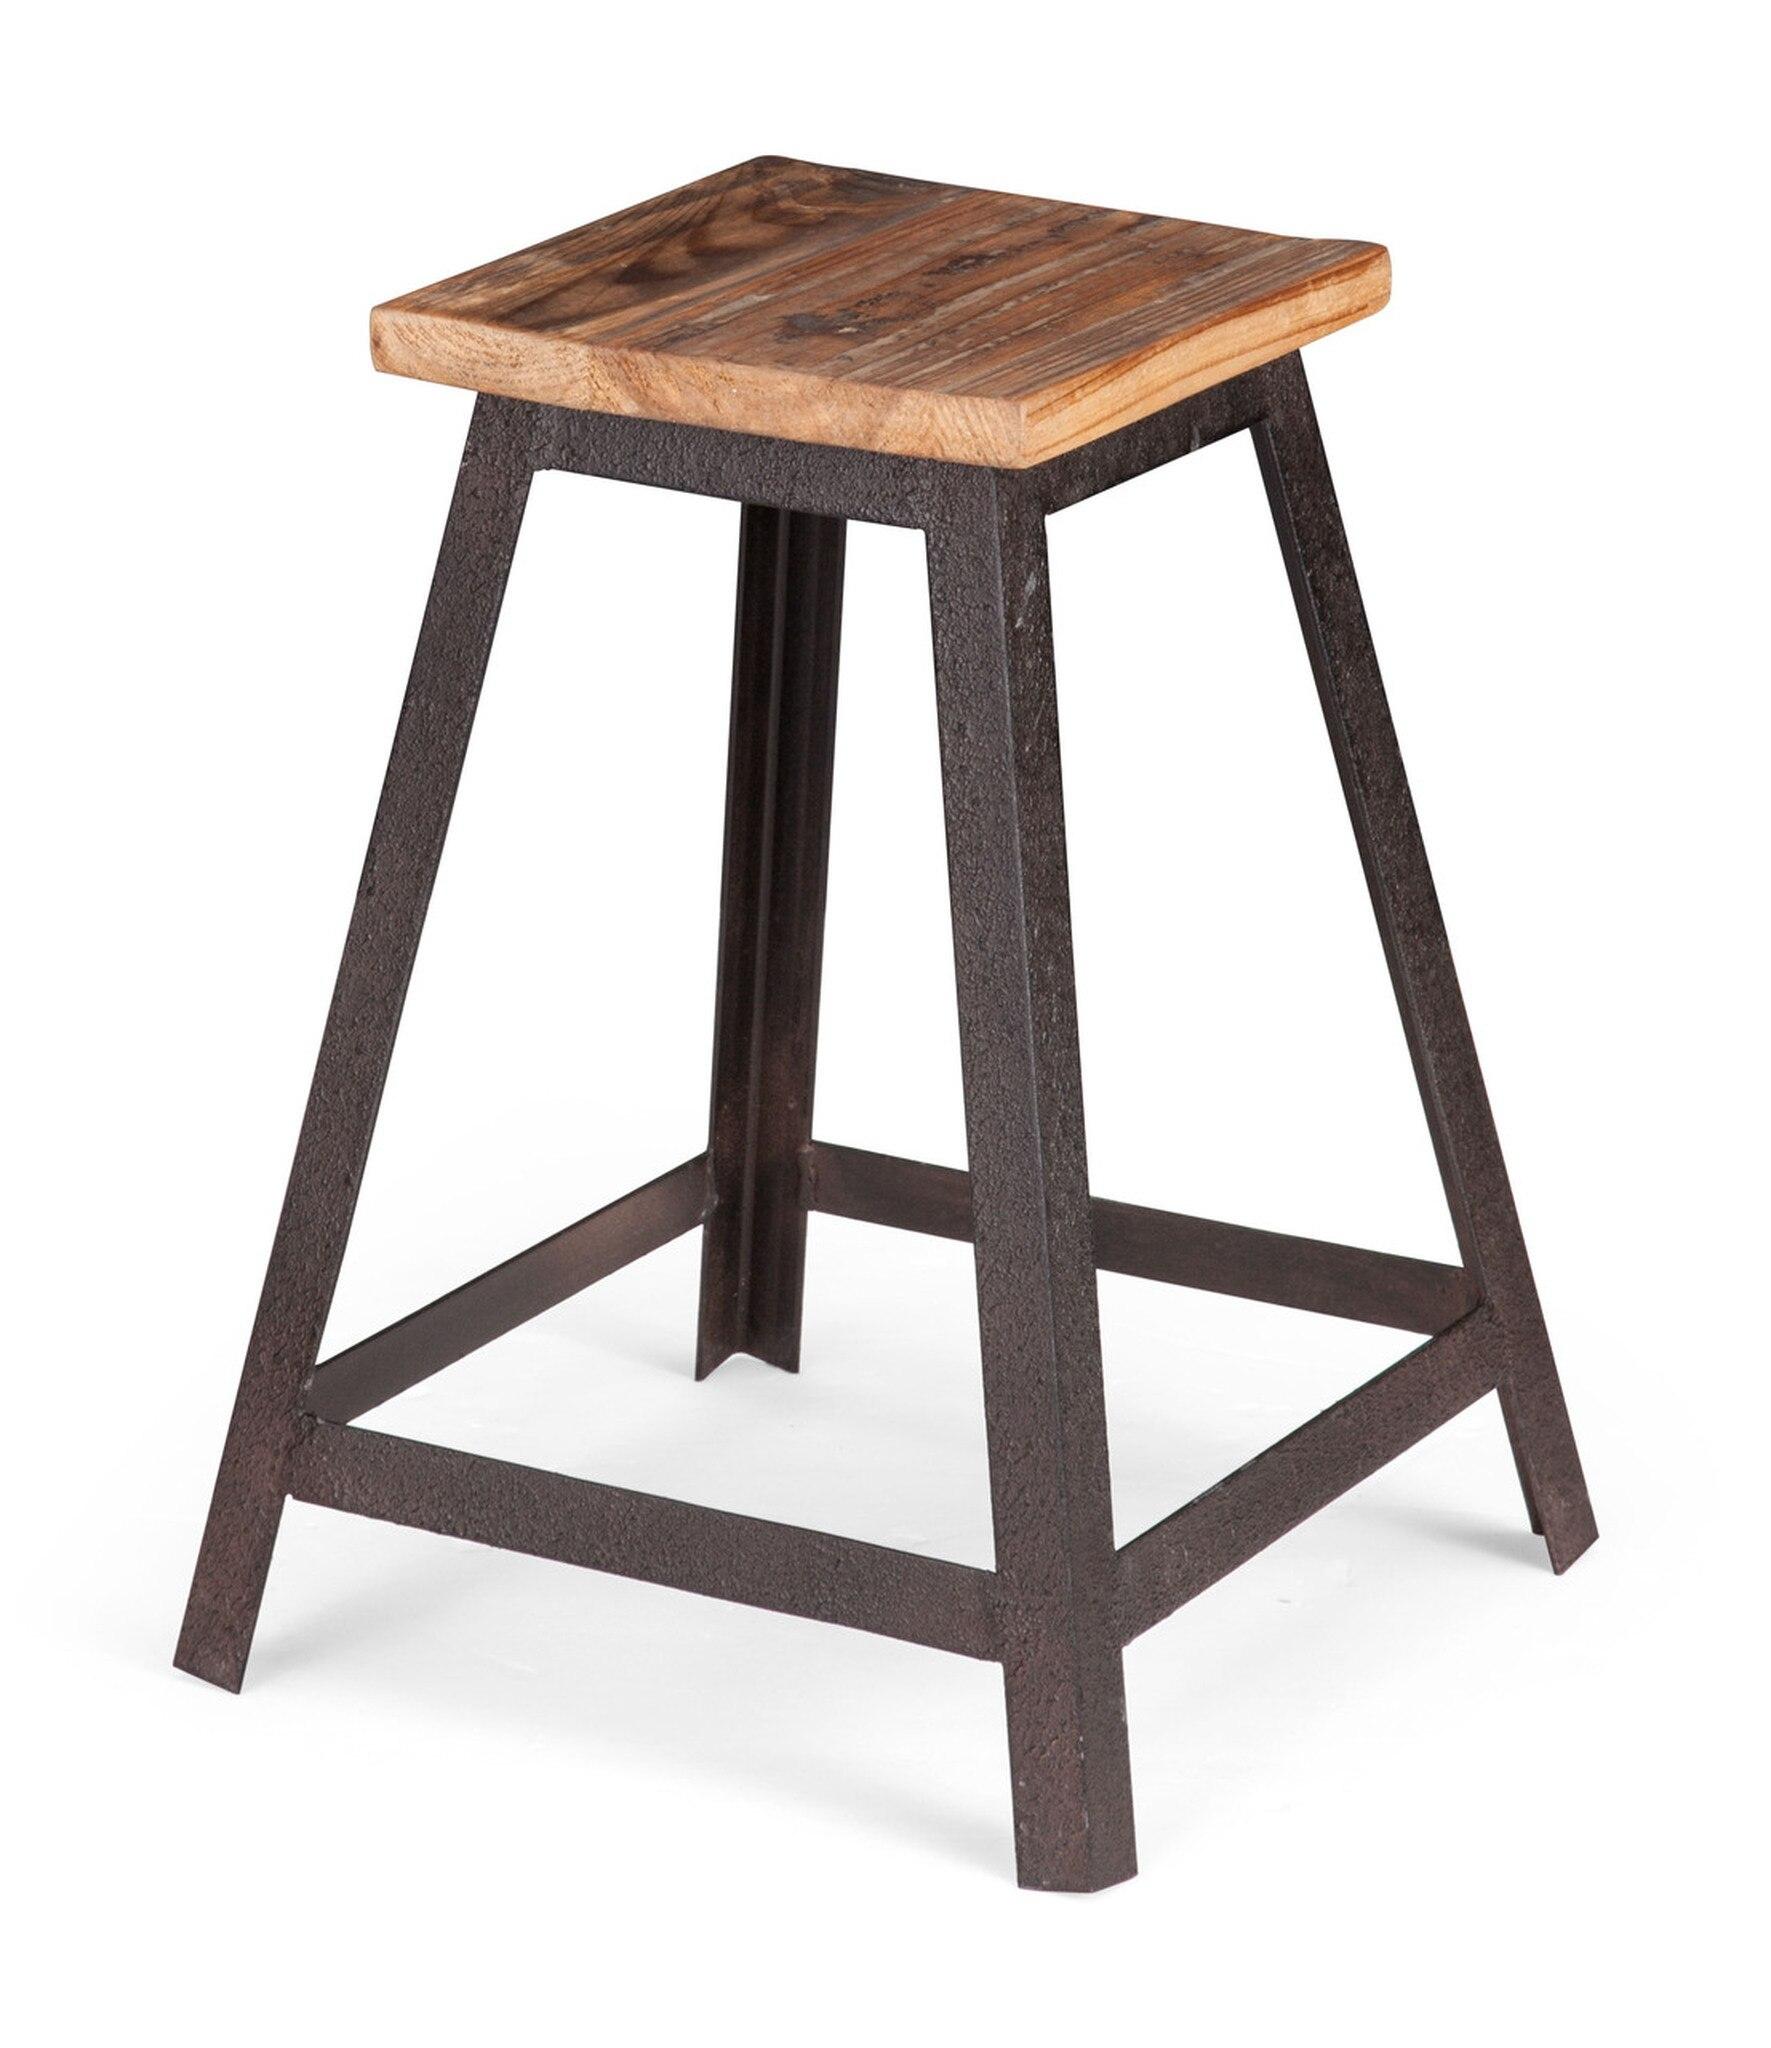 Beau Table Height Stools   Ideas On Foter